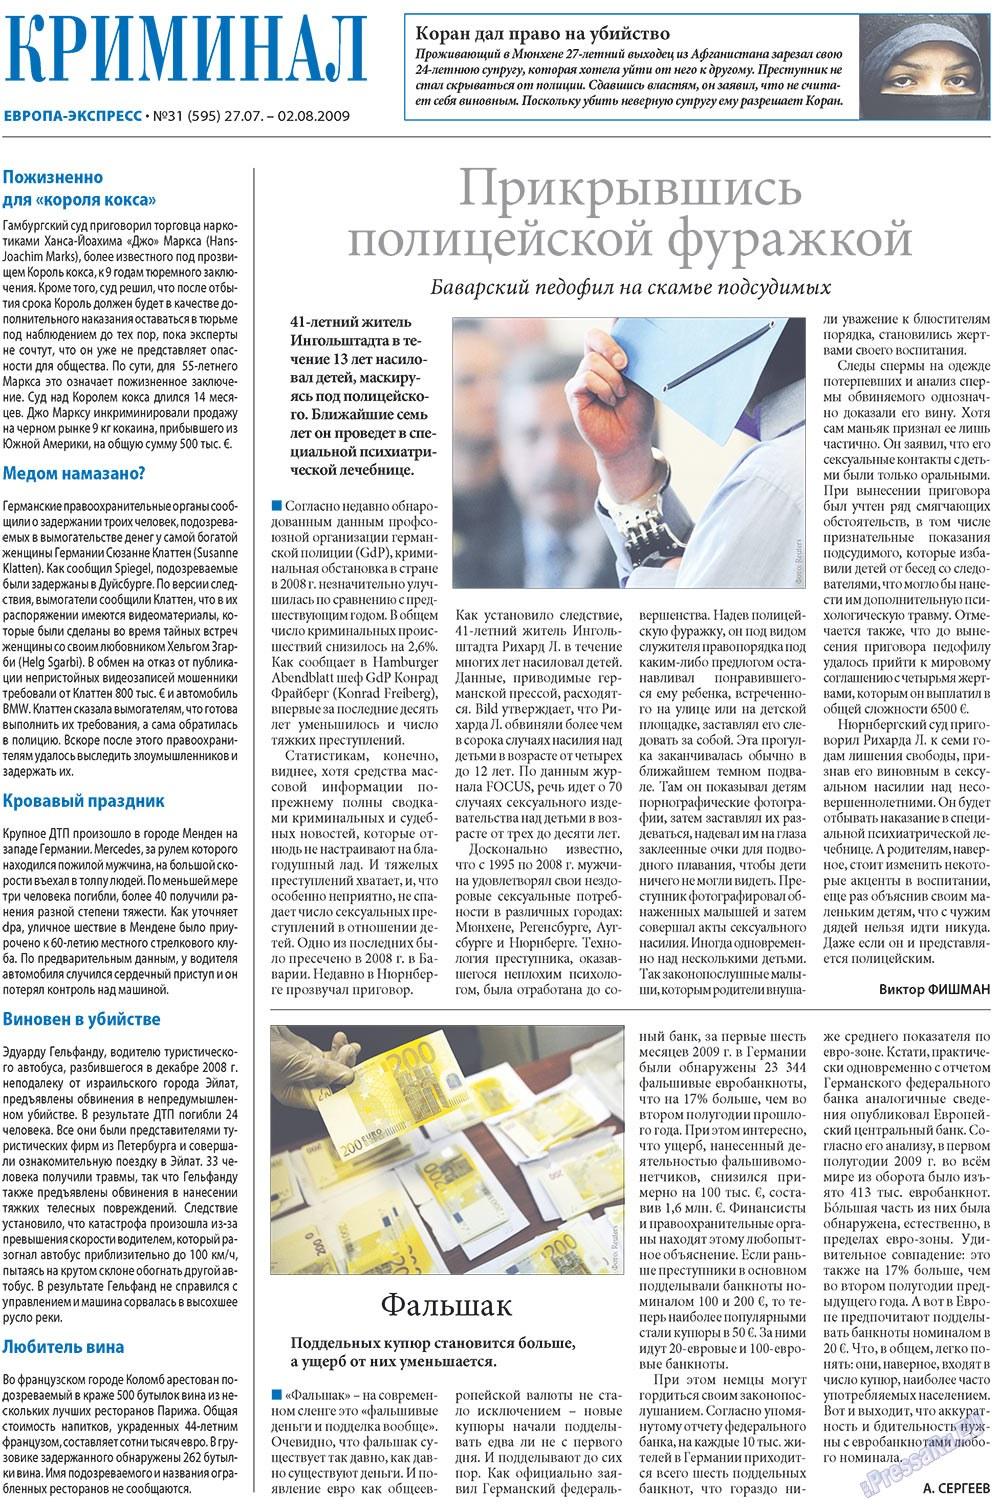 Европа экспресс (газета). 2009 год, номер 31, стр. 23